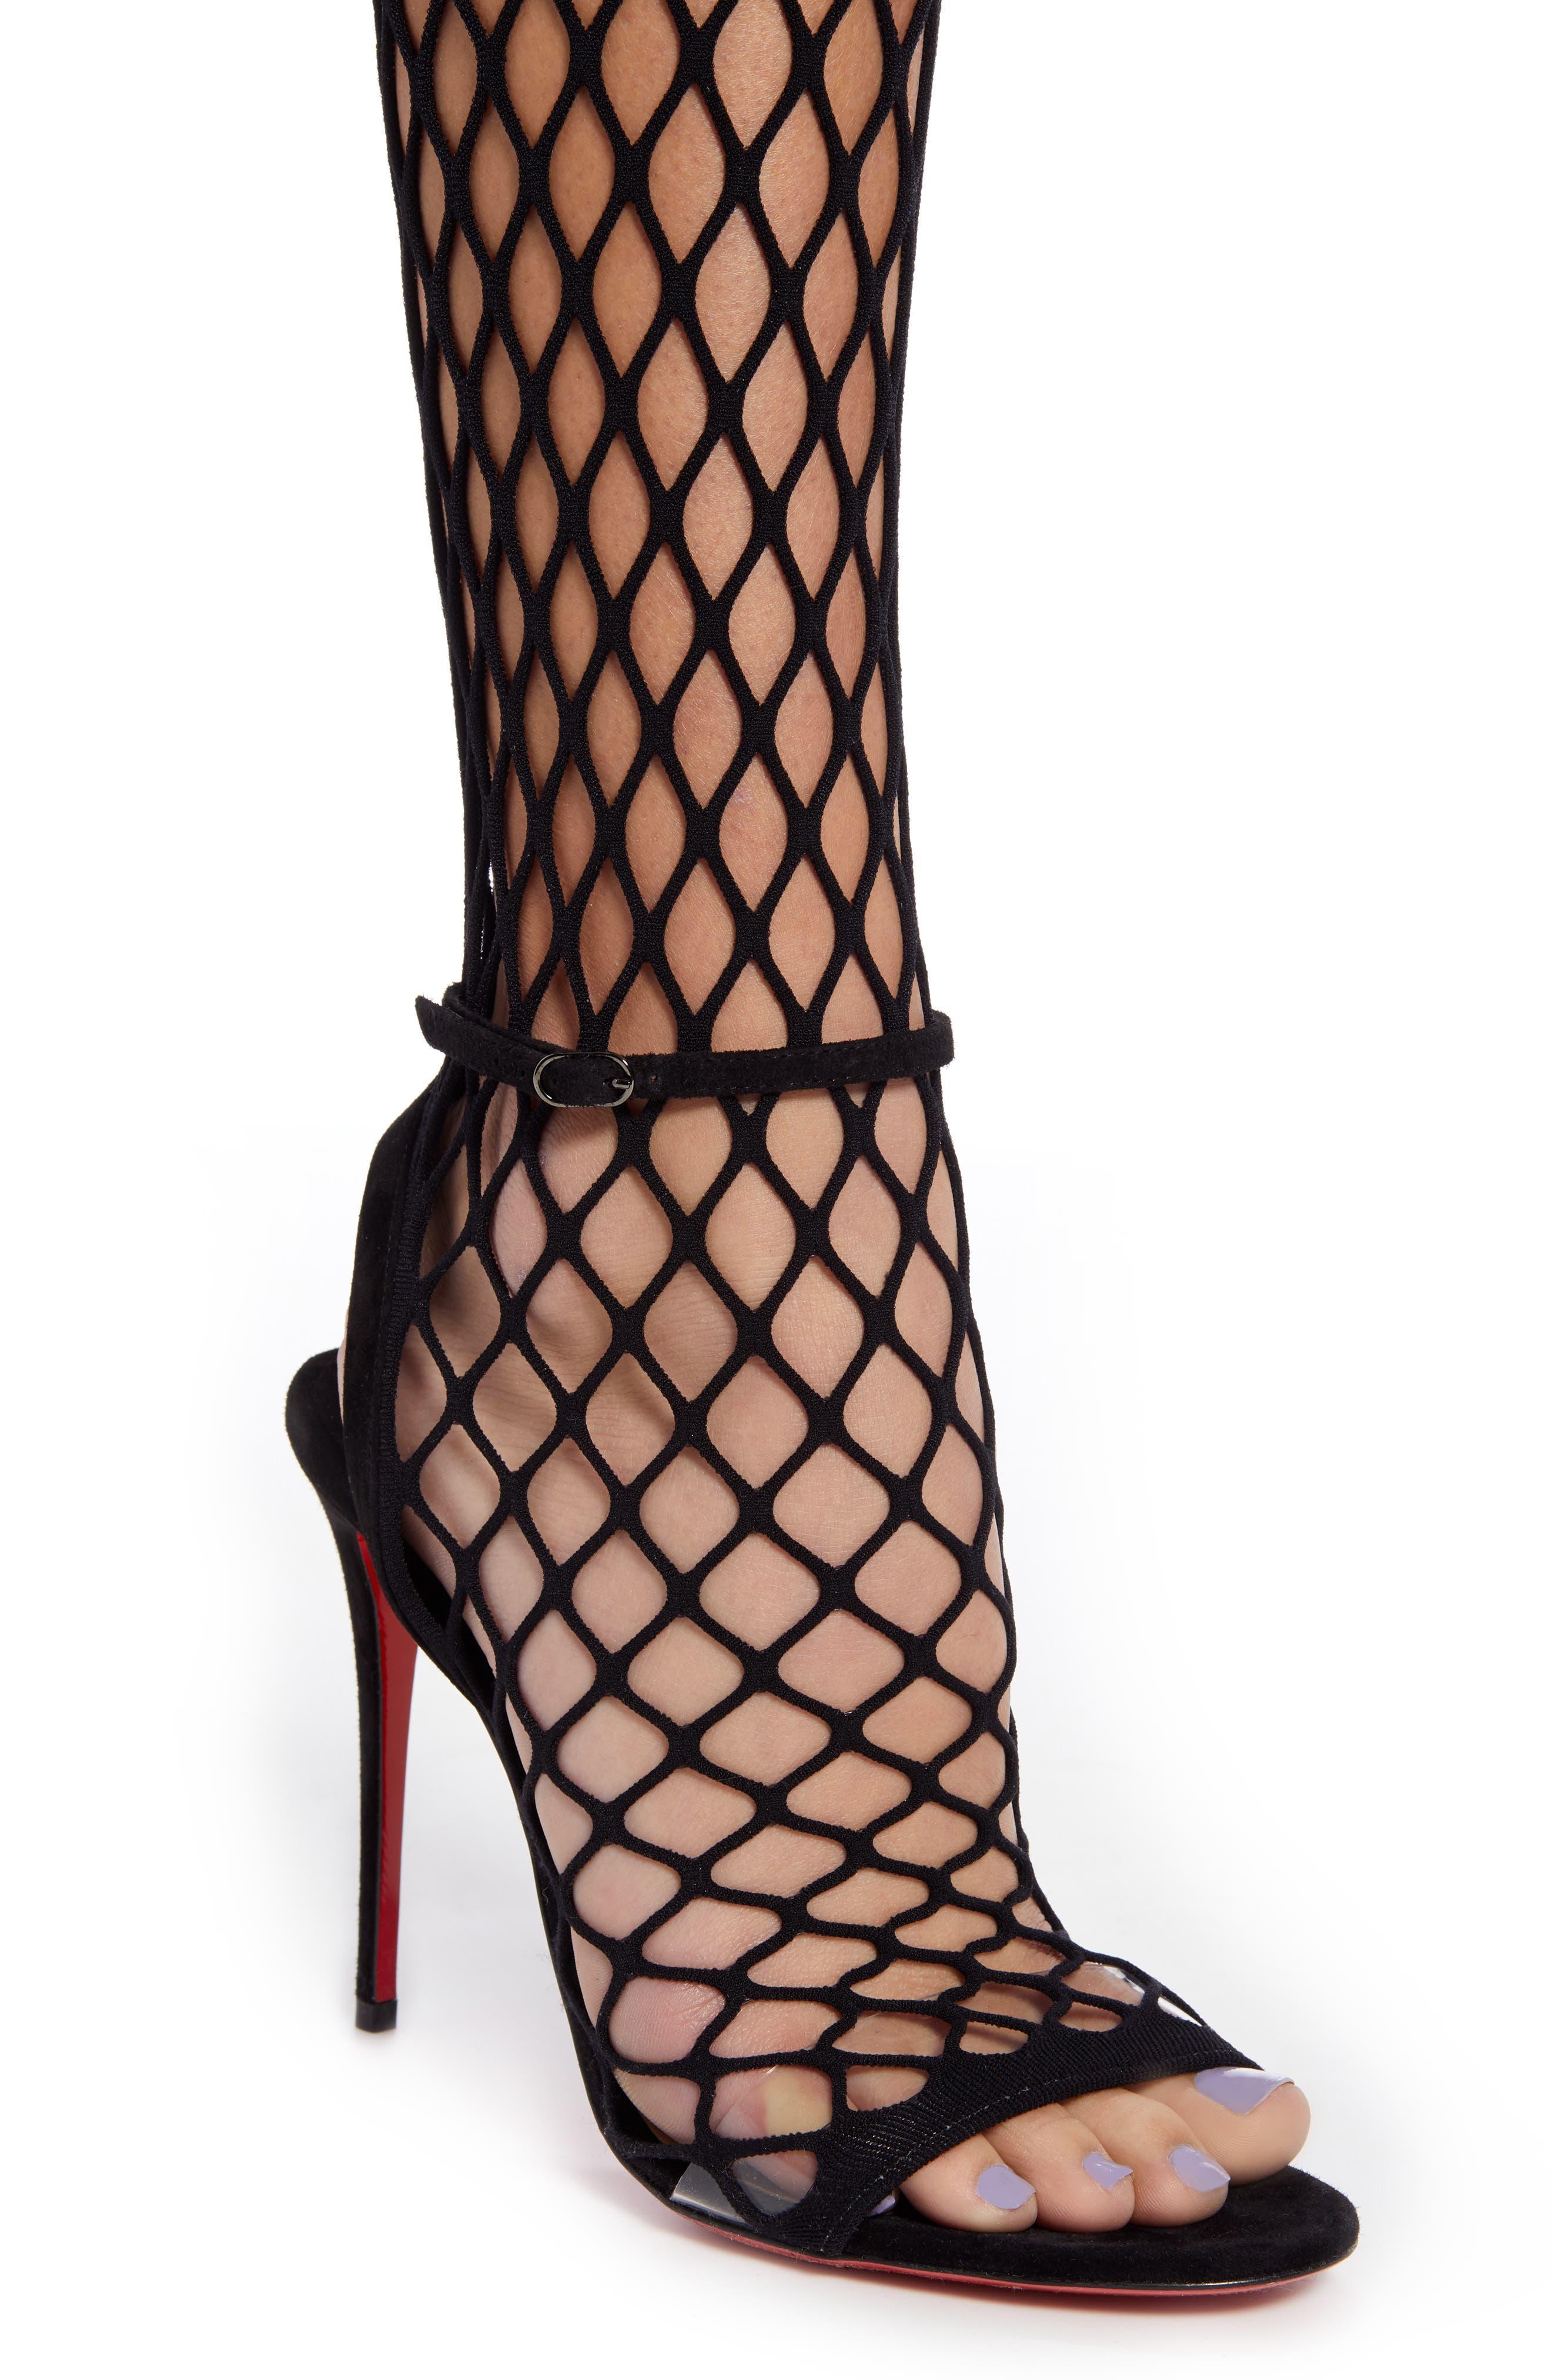 747b0fdfc6b Women designer shoes nordstrom jpg 480x730 Expensive high heel shoes